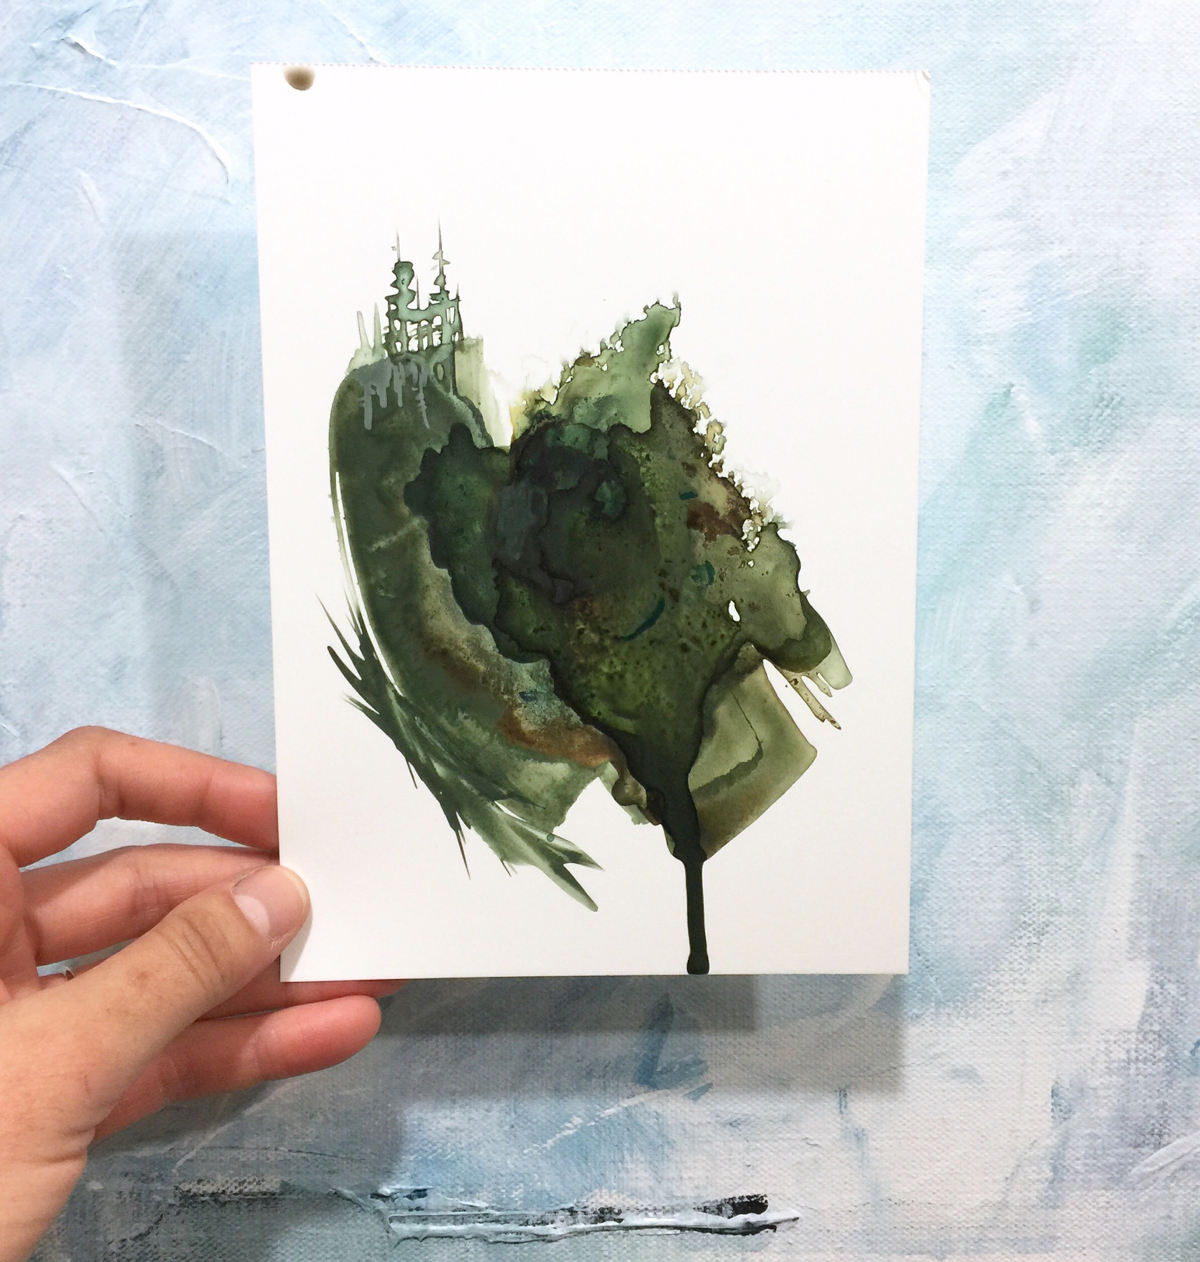 monika-kralicek-fine-art-2016-17.jpg